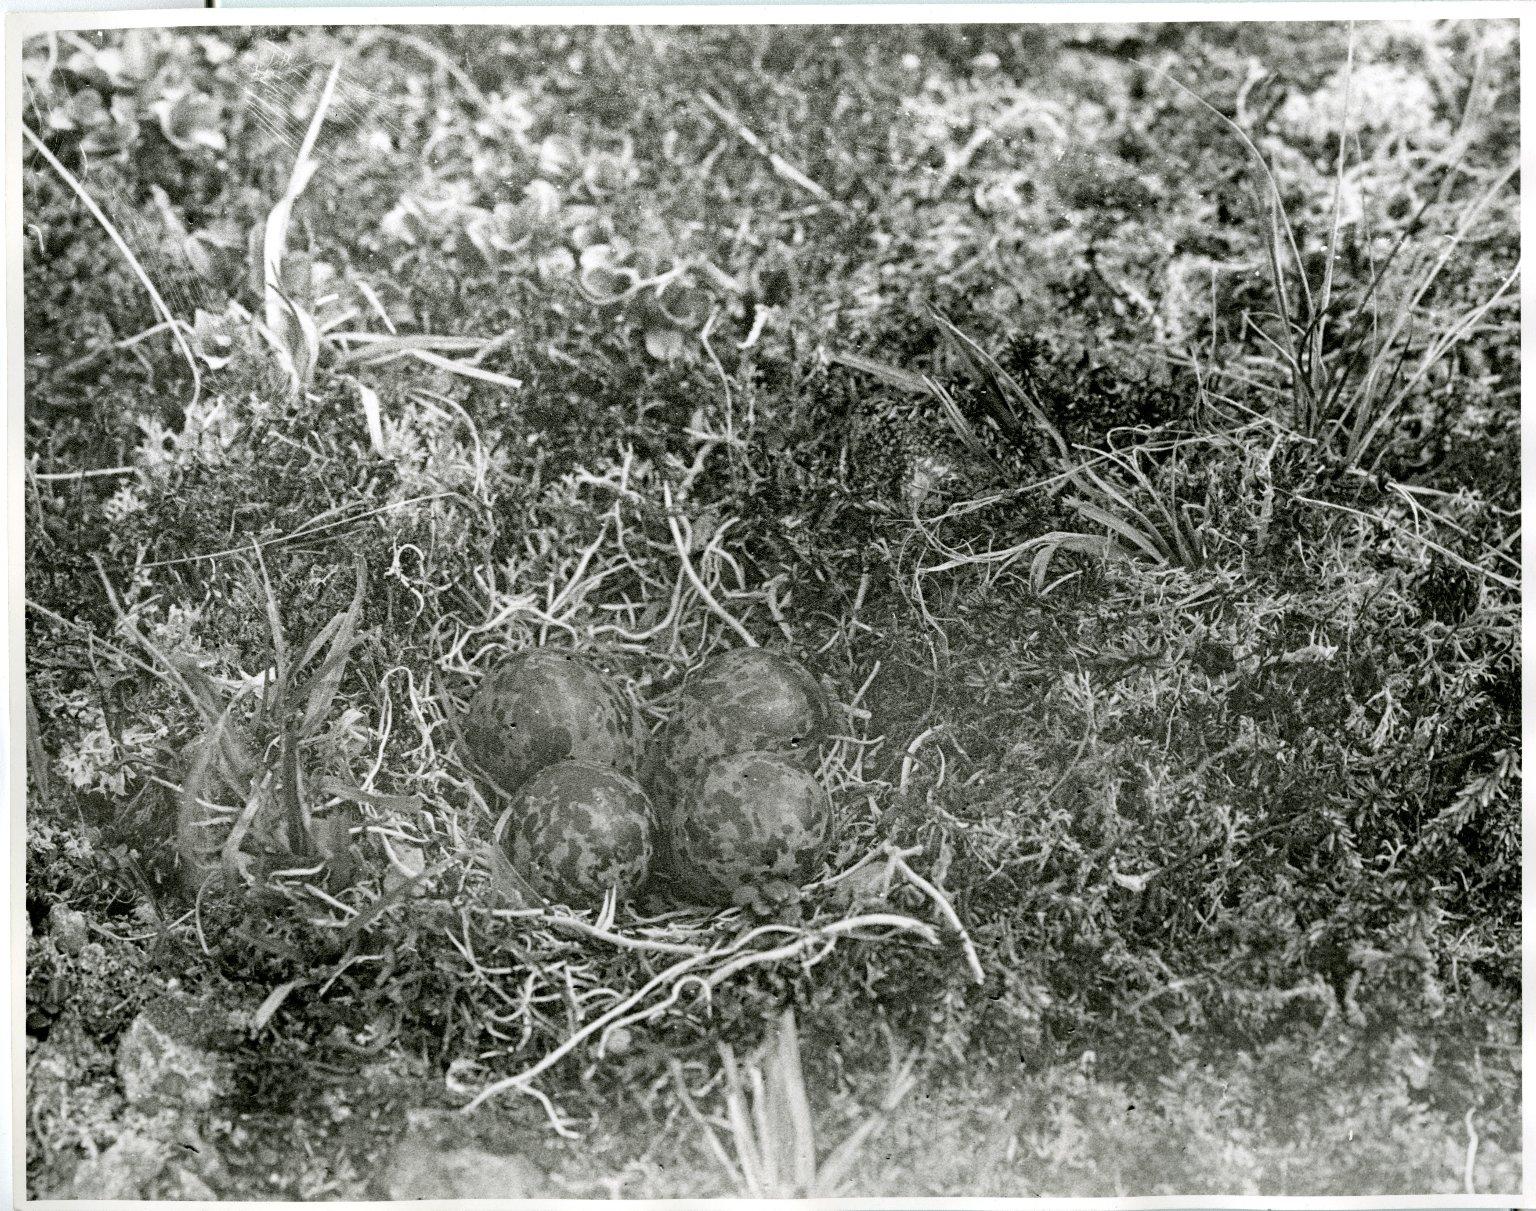 Aleutian Sandpiper nest and eggs